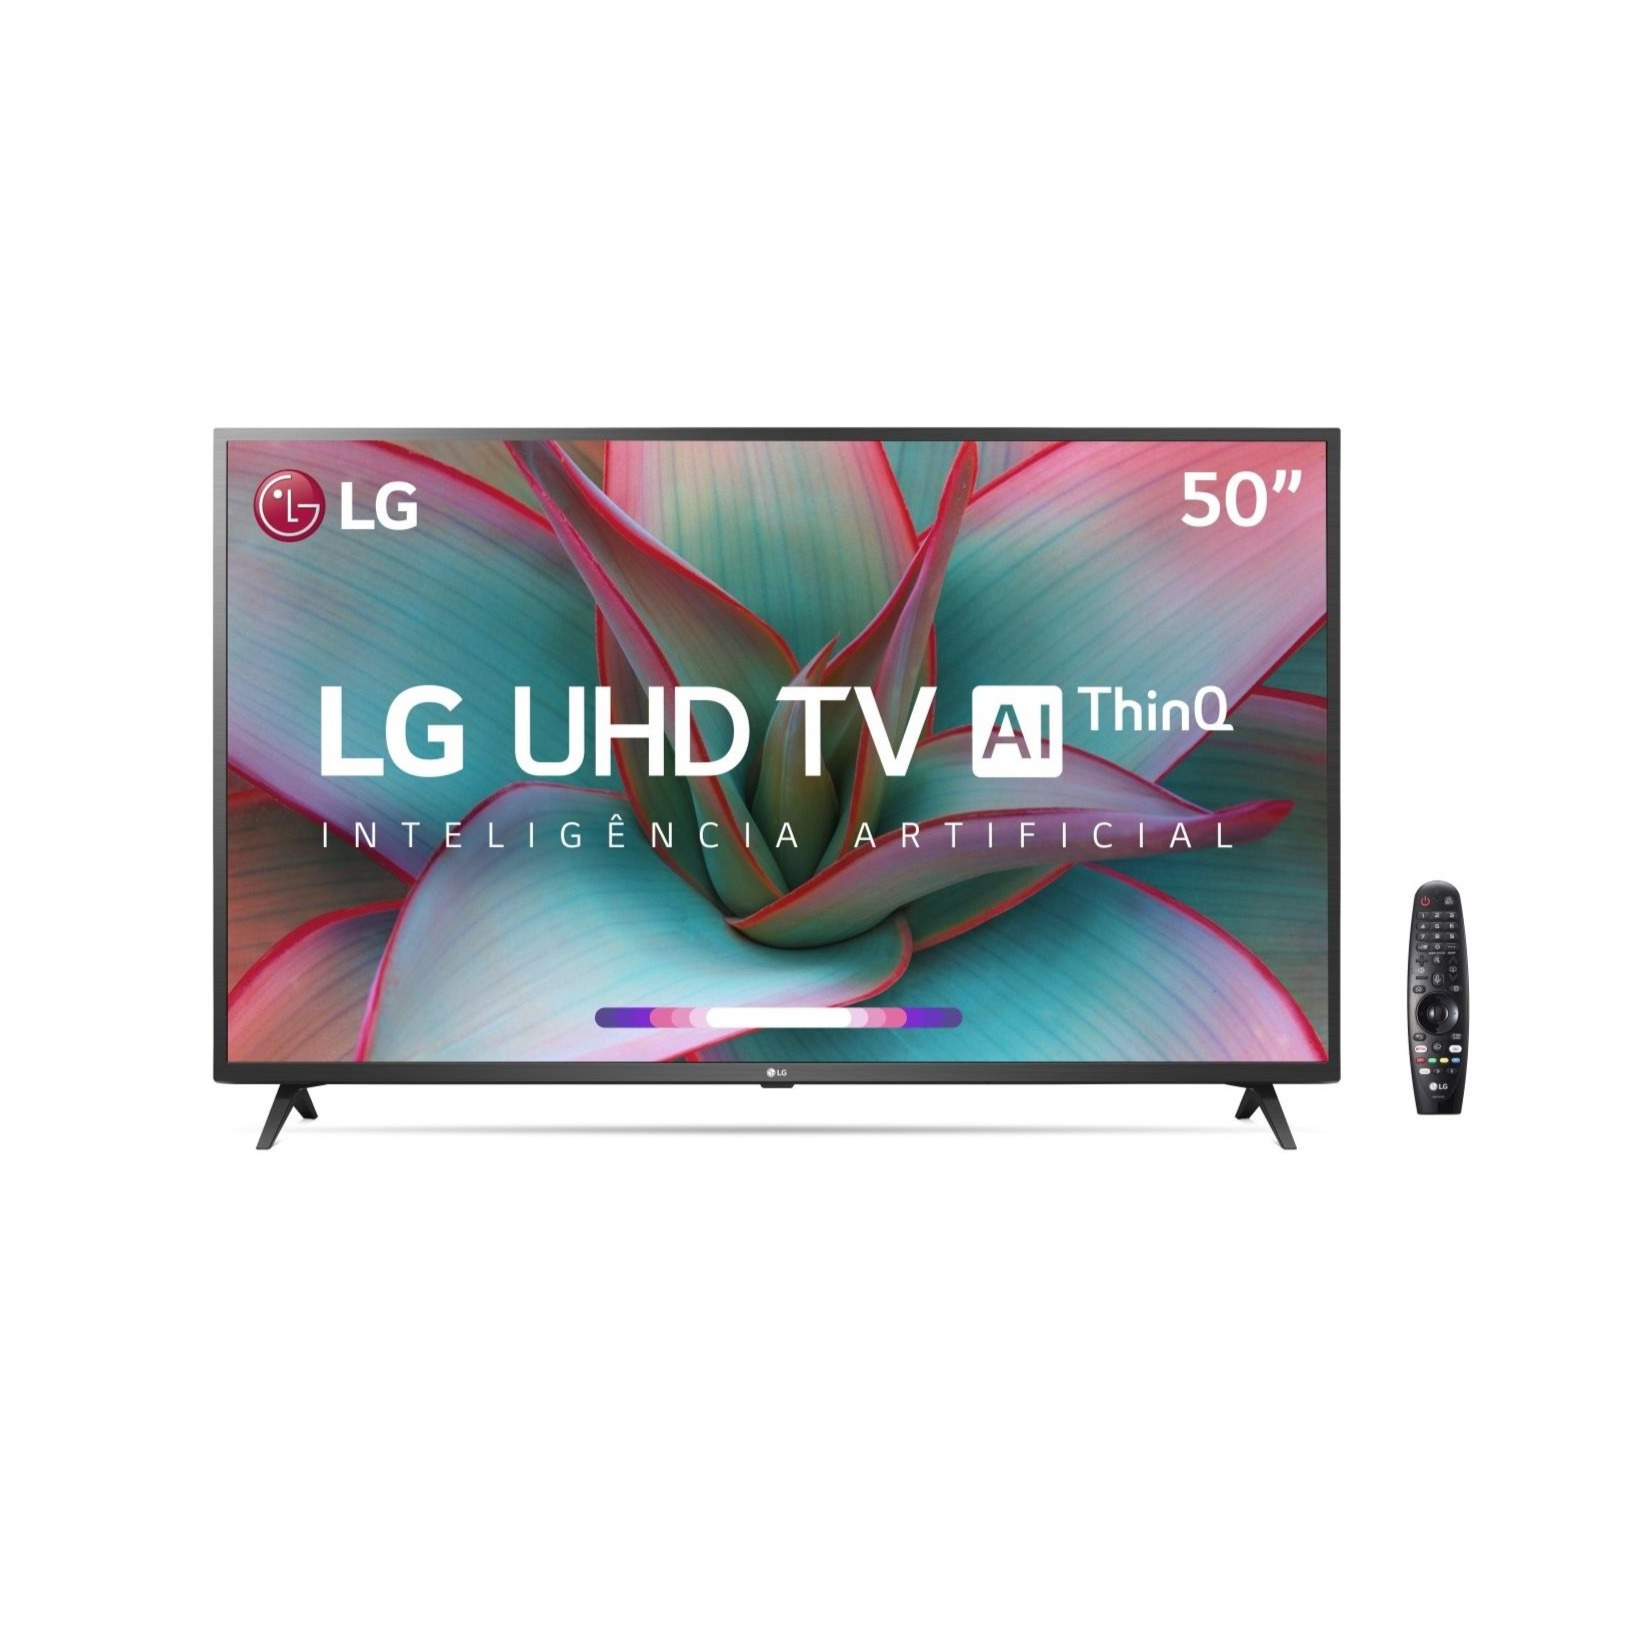 Smart TV LG 50 4K UHD 50UN7310 WiFi Bluetooth HDR Inteligencia Artificial ThinQ Smart Magic Google Alexa